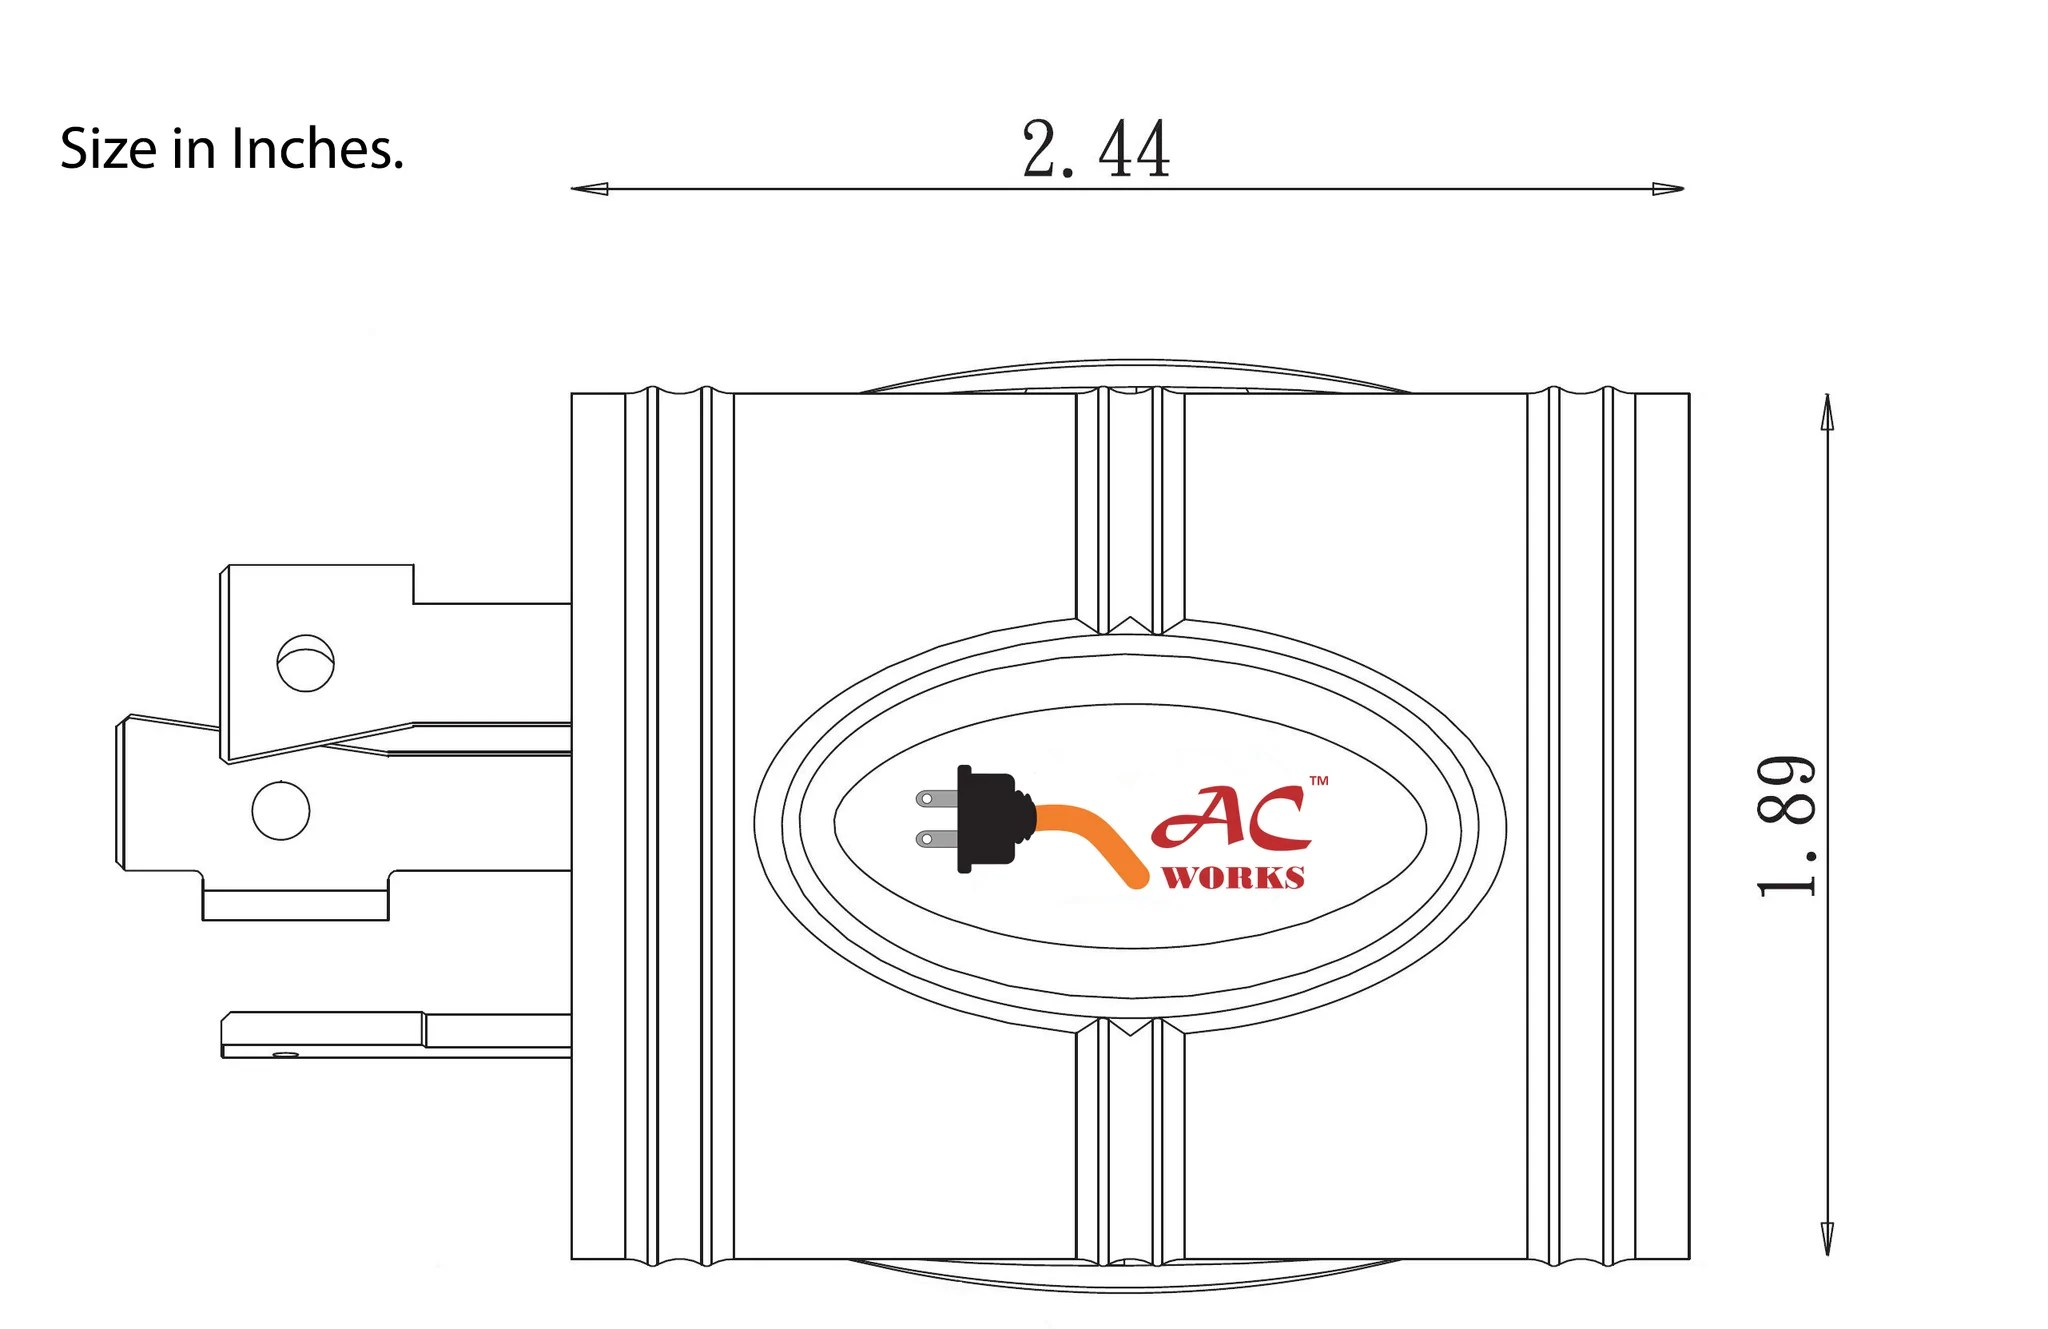 hight resolution of  ac connectors ac works adl530l520 3 prong locking plug nema l5